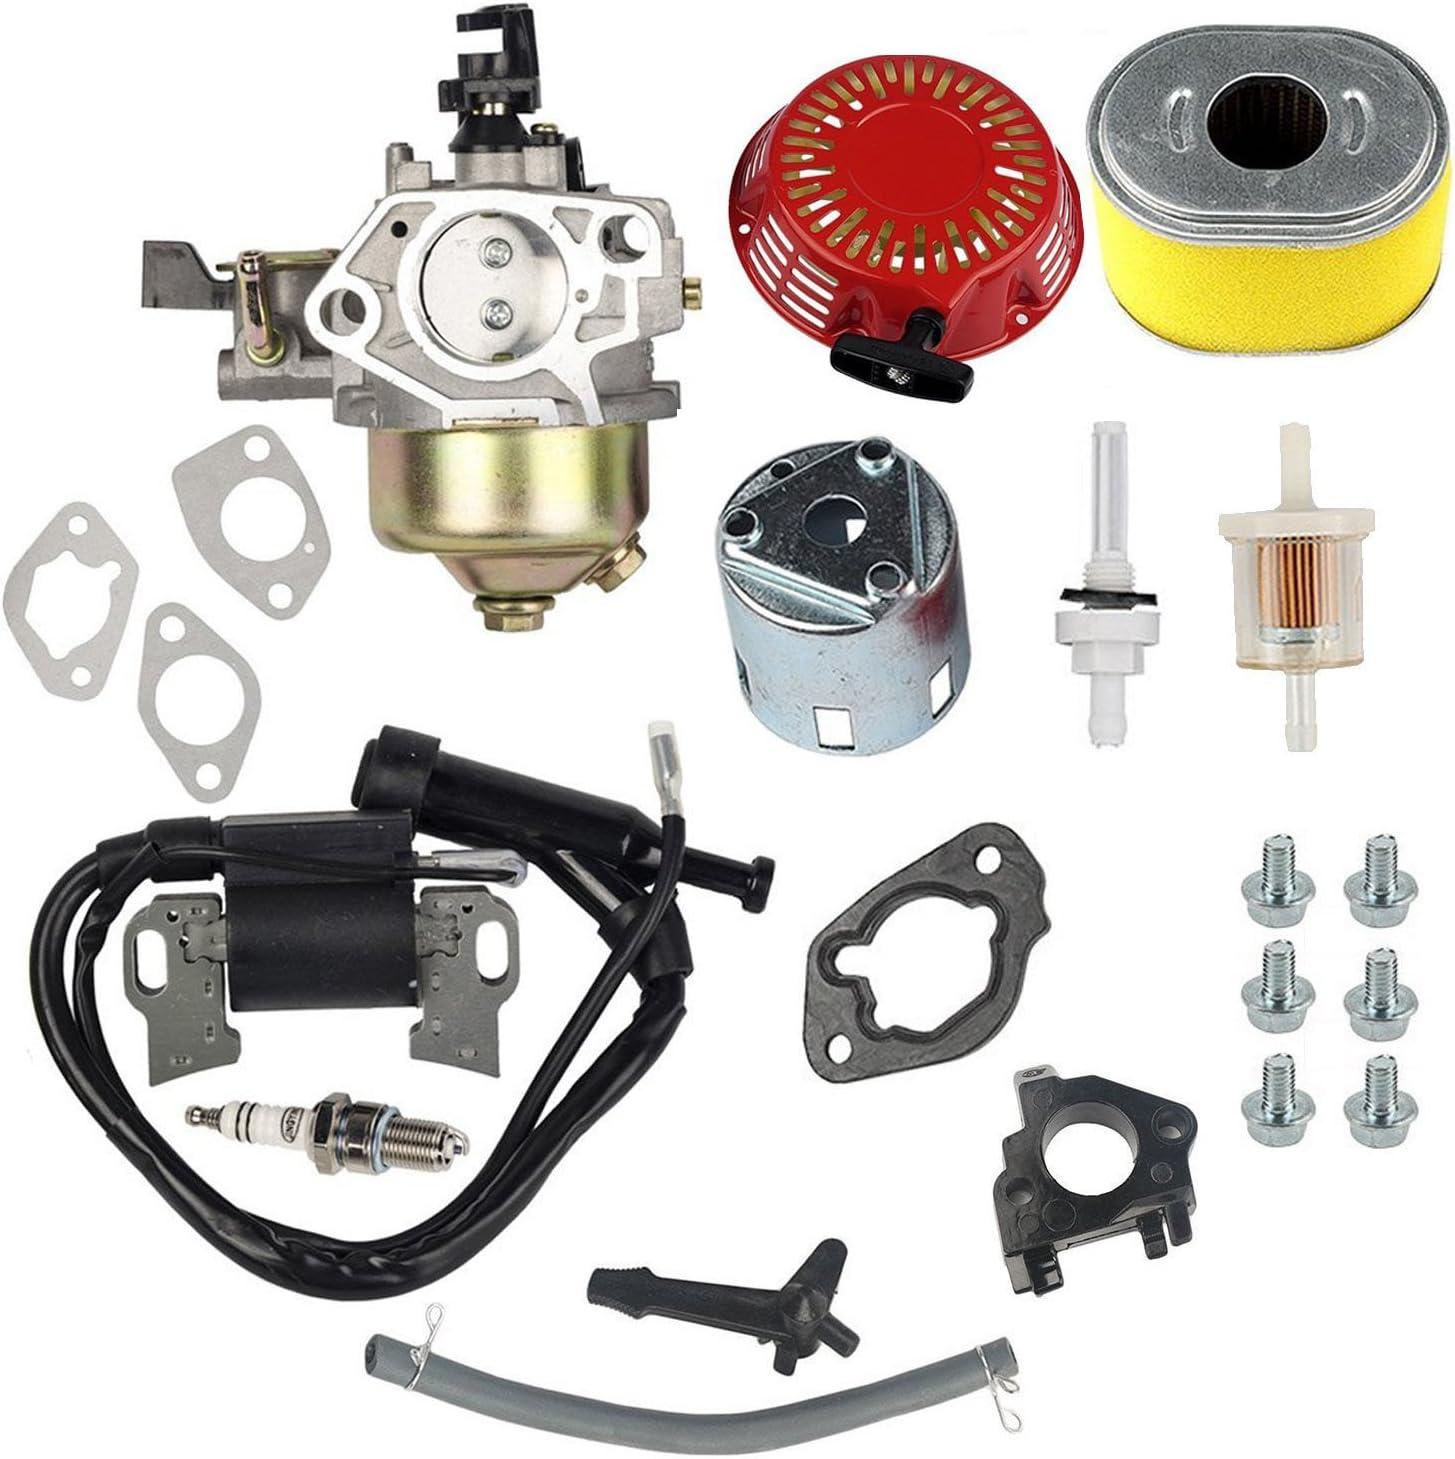 Oxoxo Carburetor Ignition Coil Recoil Starter Spark Plug Air Filter Fuel Filter Jonit Filter For Honda Gx340 Gx390 11hp 13hp Engine Lawn Mower Garten